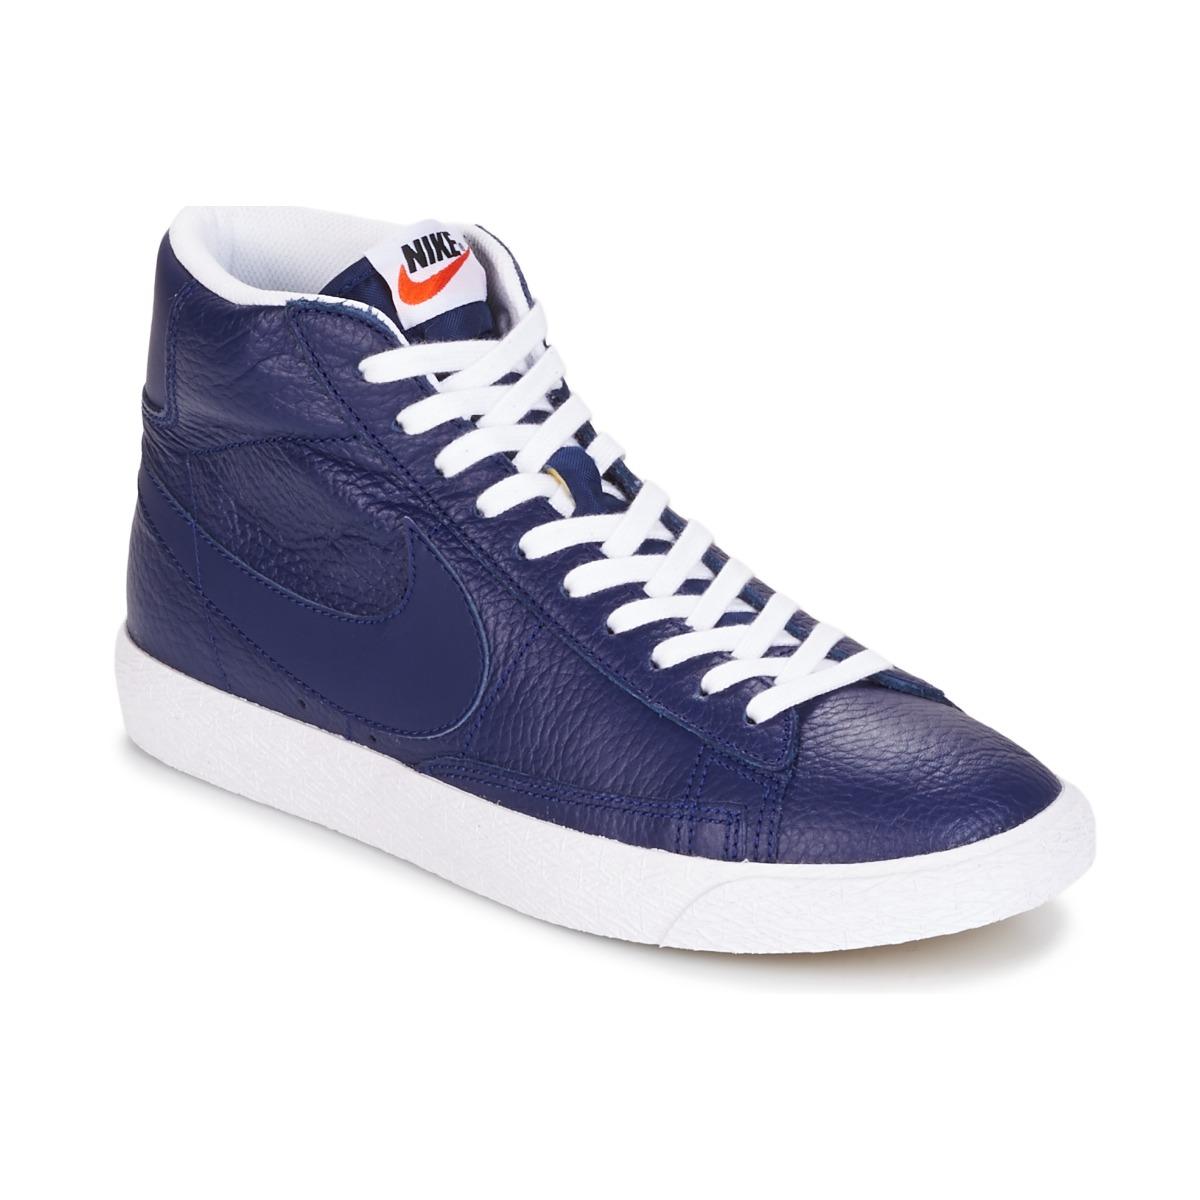 nike blazer mid bleu chaussure pas cher avec chaussures basket montante homme 99 99. Black Bedroom Furniture Sets. Home Design Ideas